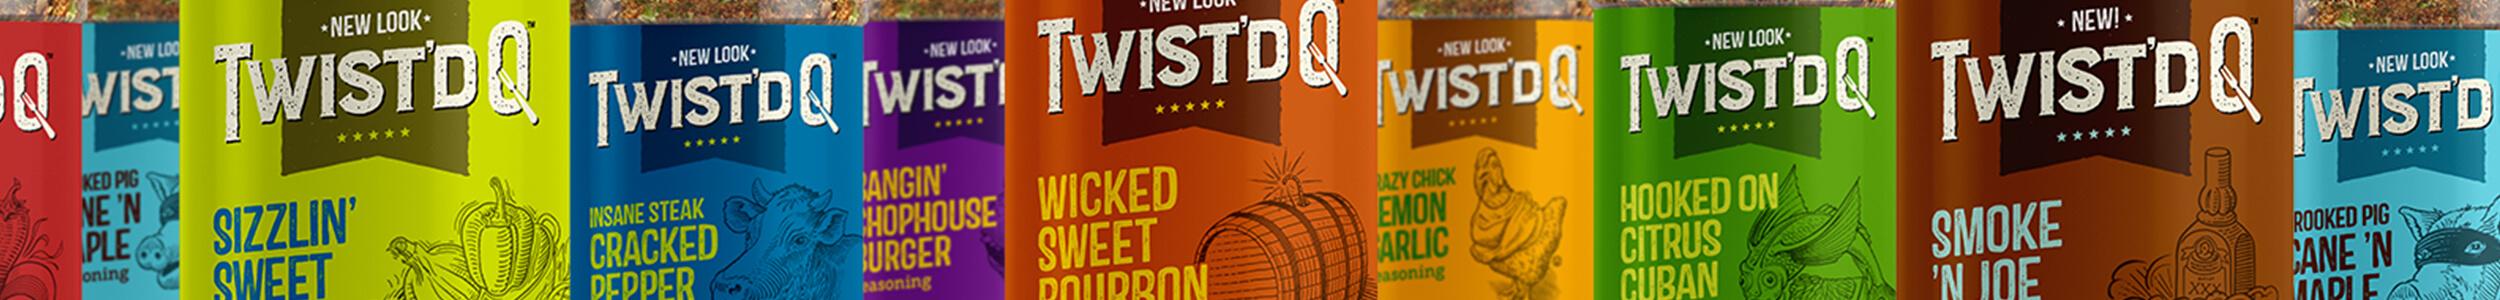 Best Packaging Design Agency in Chicago - Pivot Forward